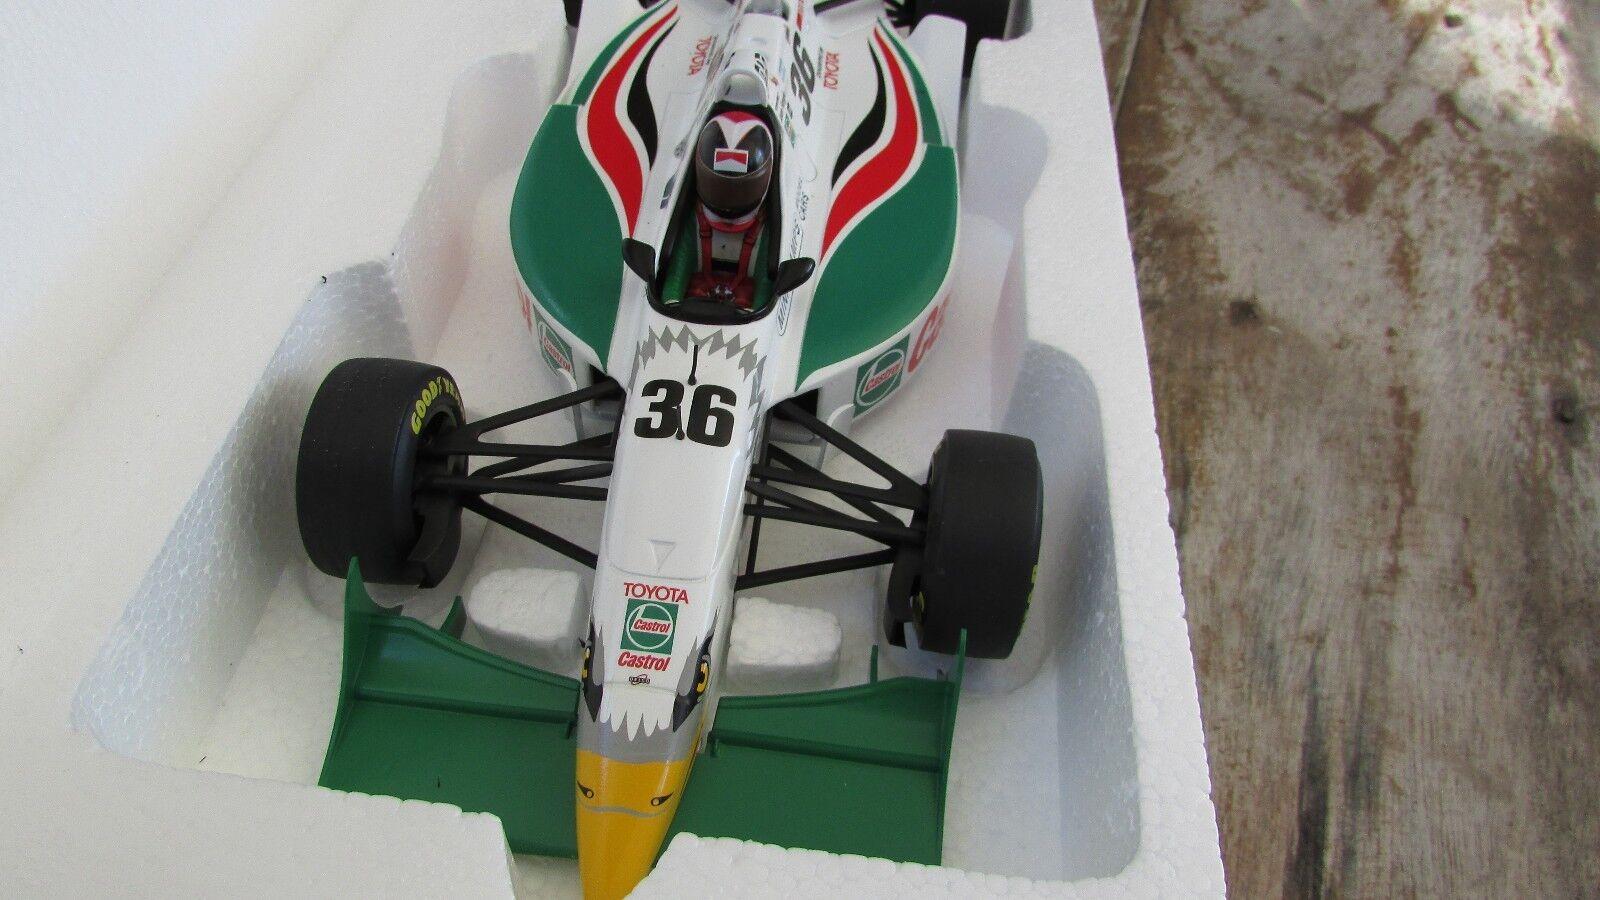 Minichamps Ut Gurney Eagle Mkv 1998 Indy Typ Rennauto Juan Fangio 2 1 18 Skala